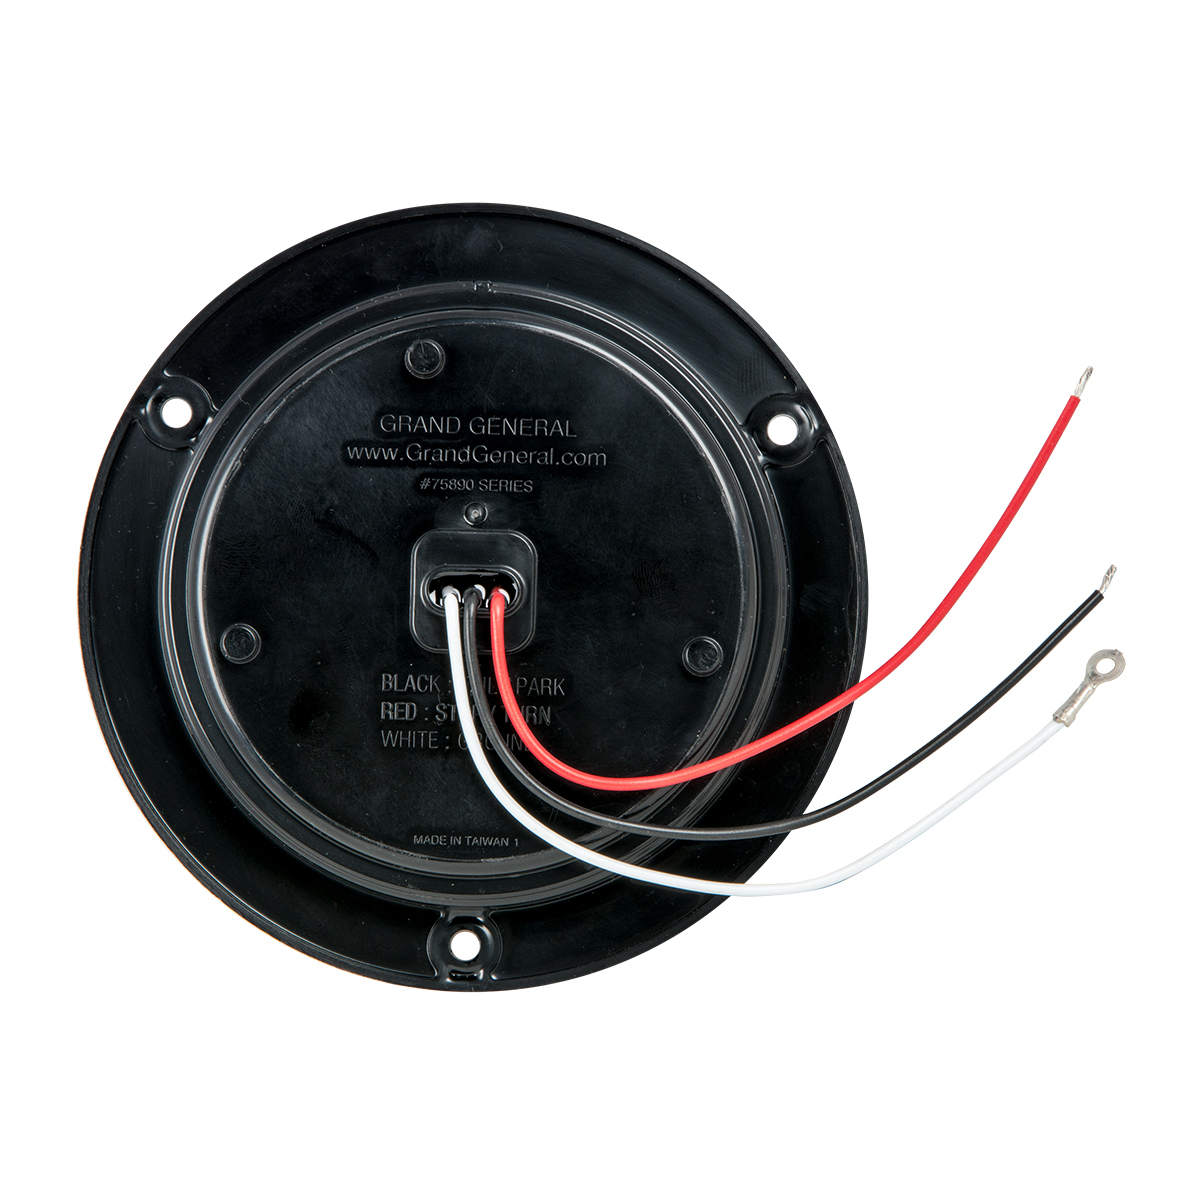 "4"" Fleet LED Light with Black Flange Mount in 3 Wires"